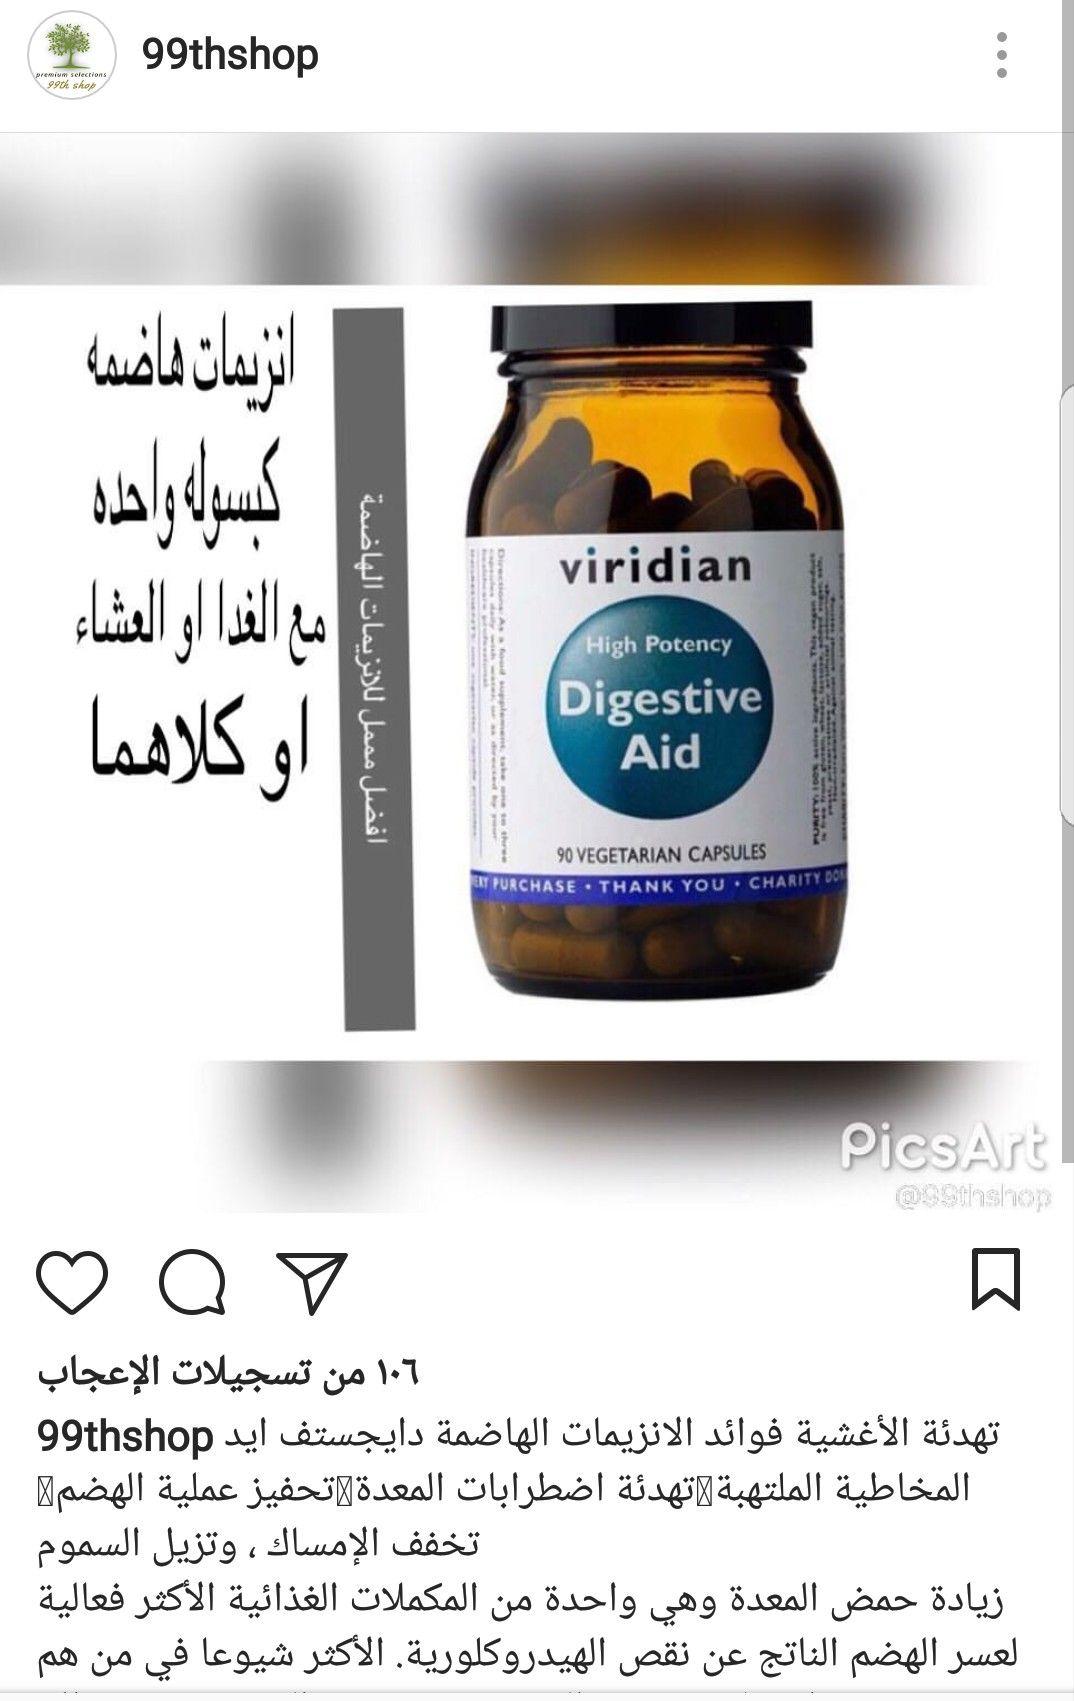 Pin By Mm On معلومات صحية وغذائية عامه Digestion Health Vaseline Bottle